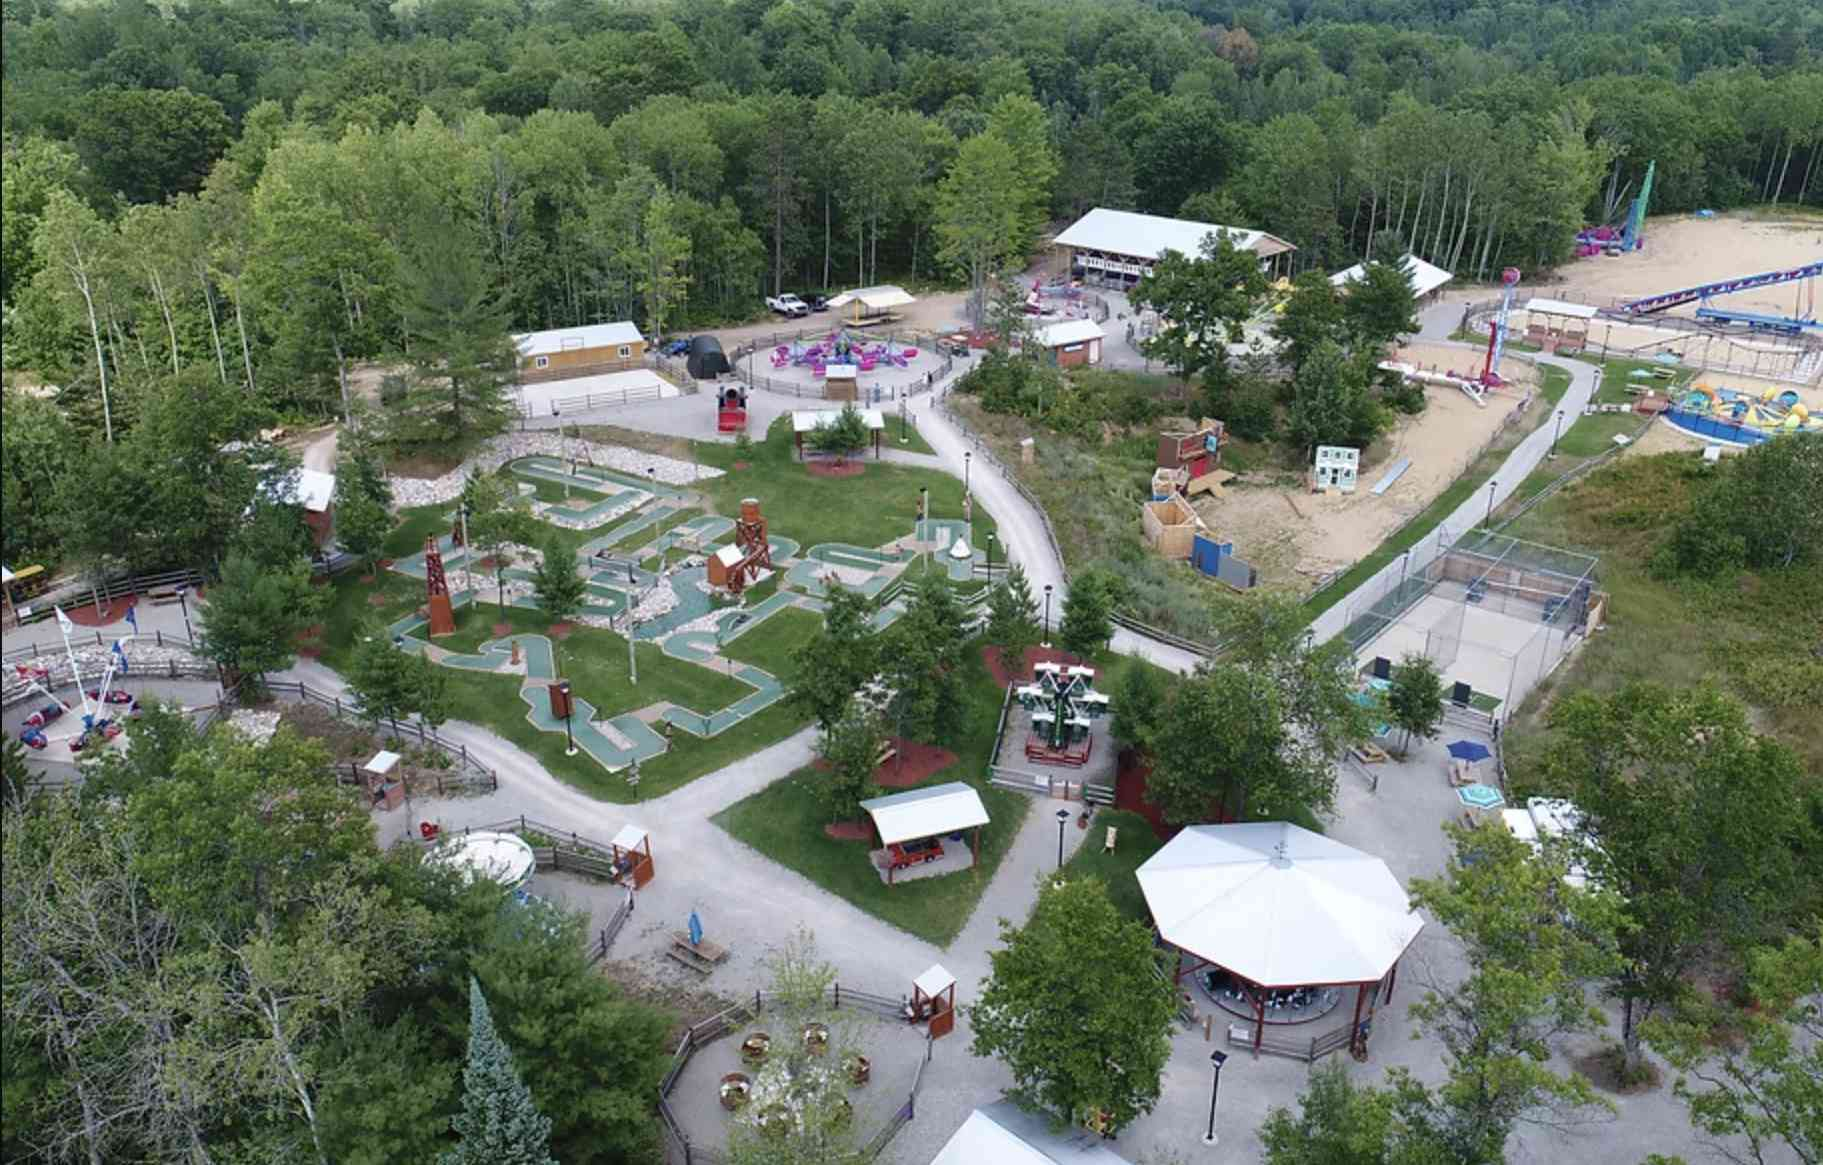 Wild Frontier Fun Park in Comins, Michigan